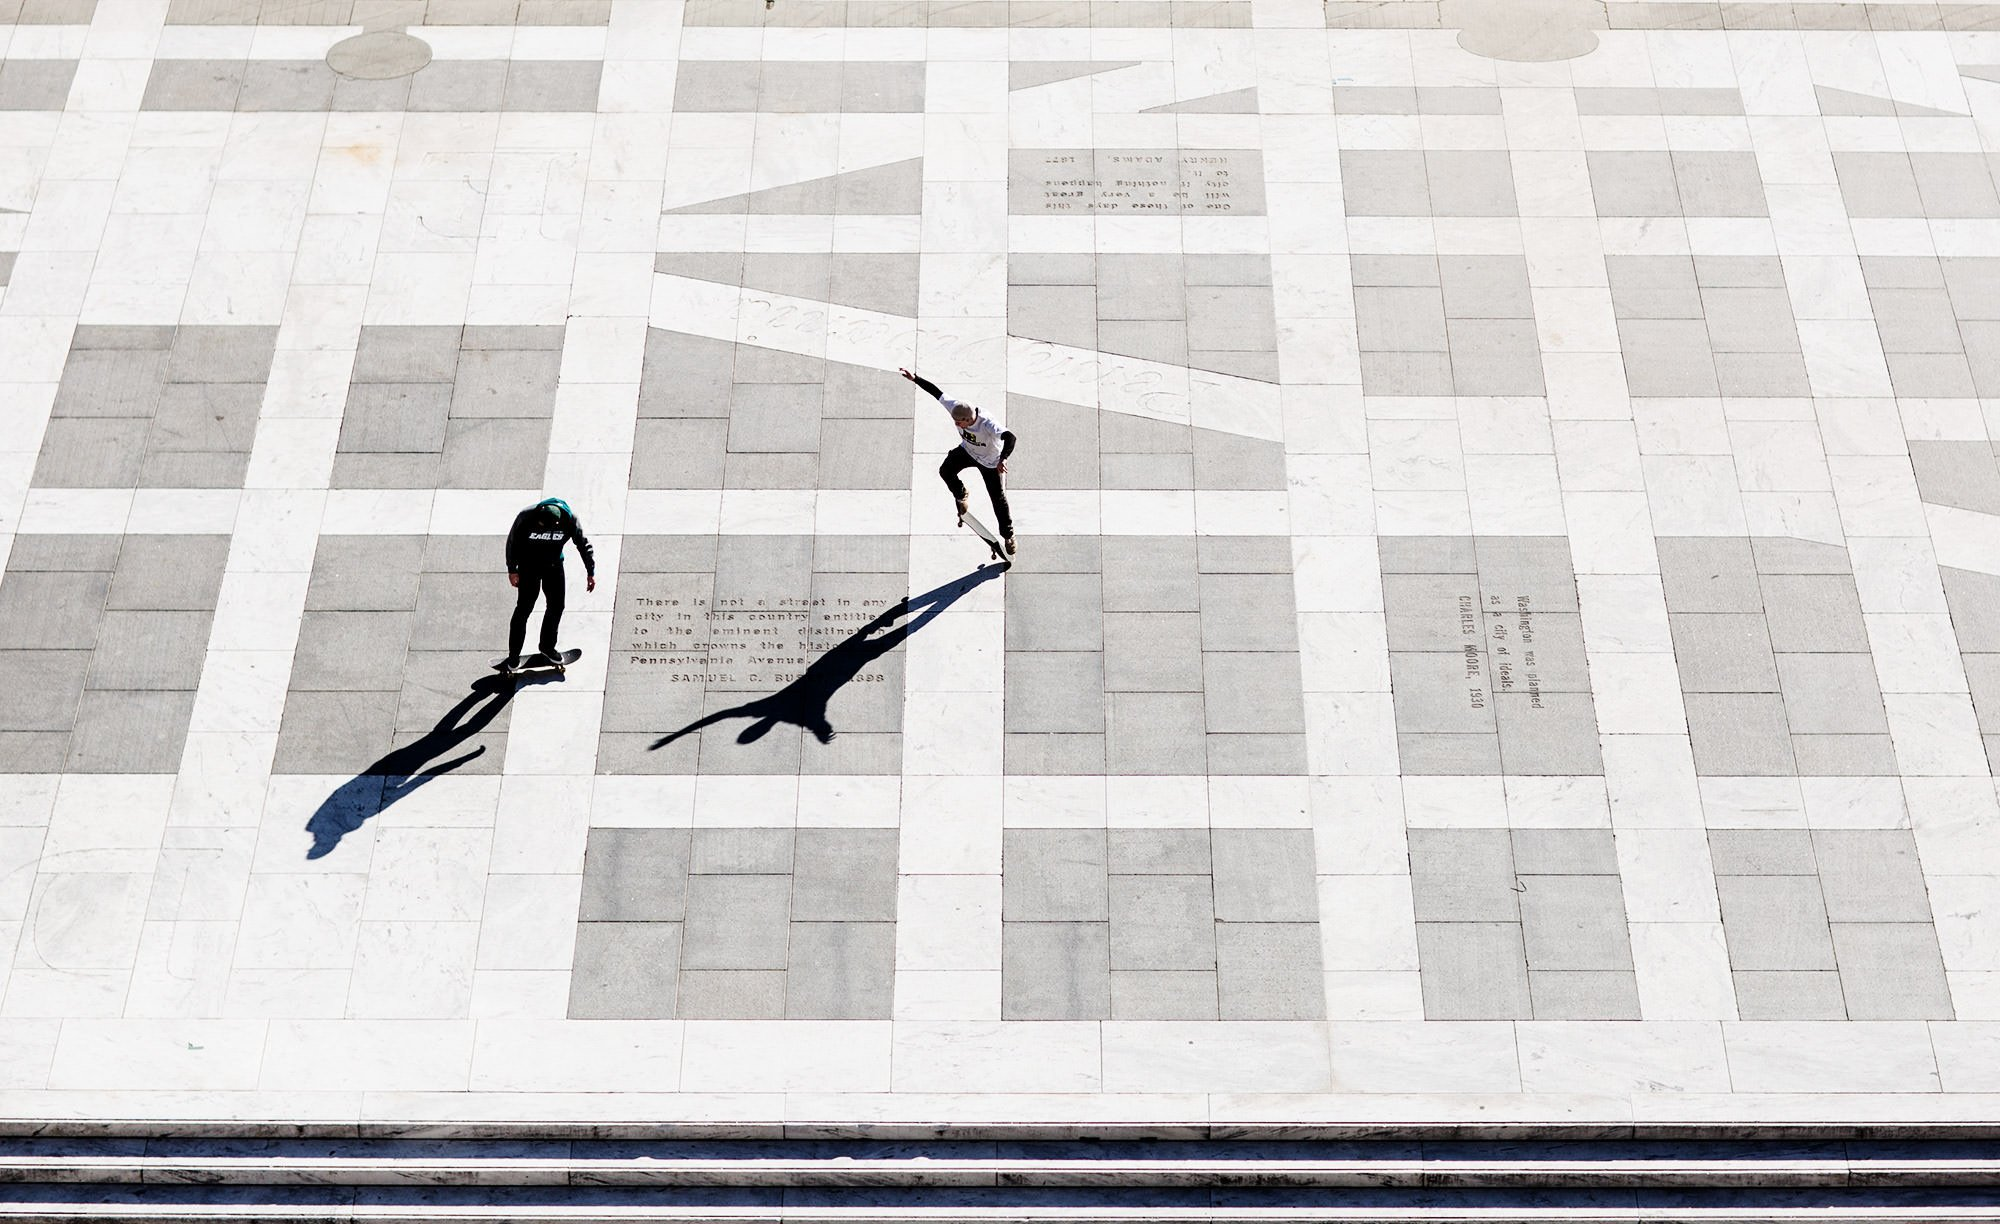 Freedom Plaza Skateboarding